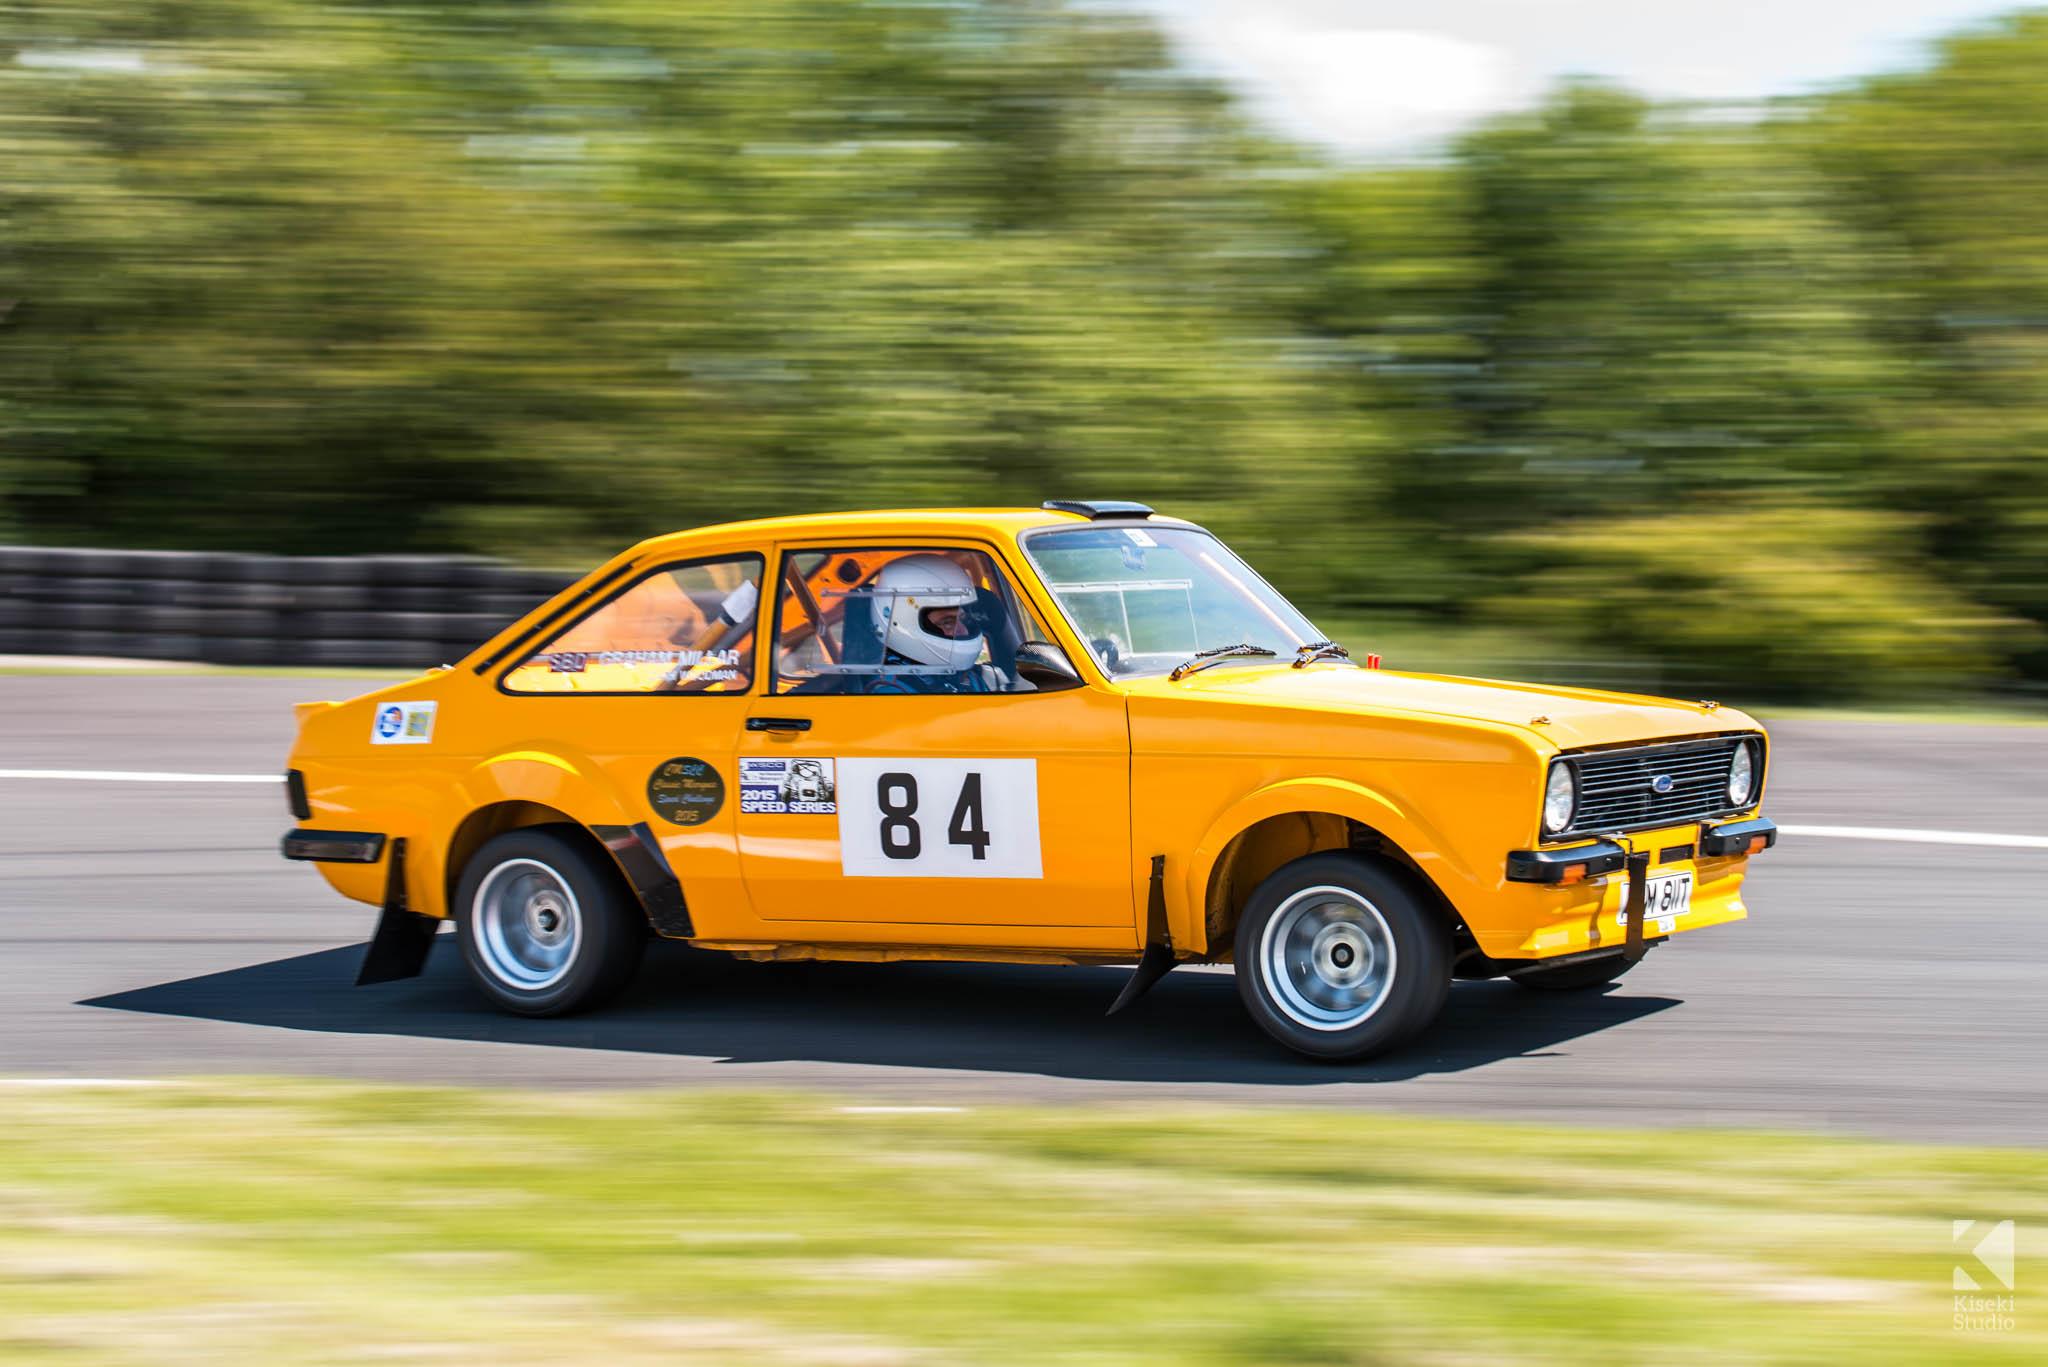 Ford Escort Mk2 drifting